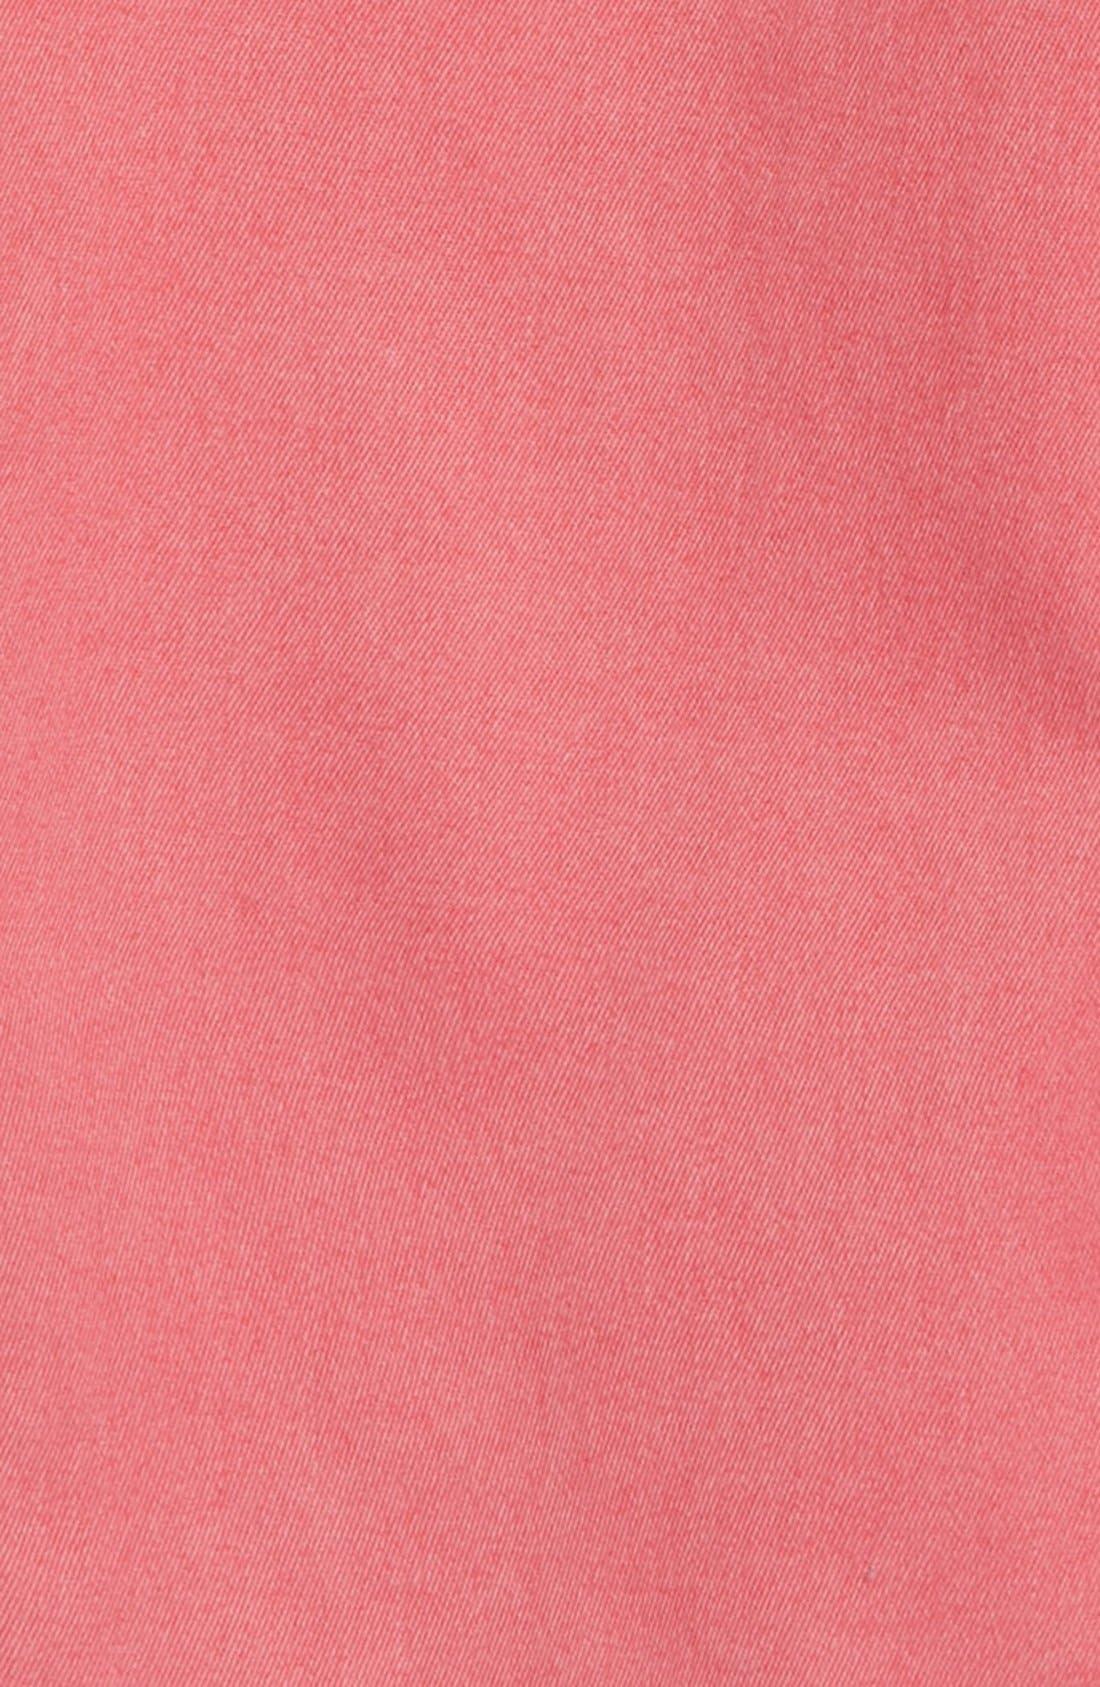 Breaker Pants,                             Alternate thumbnail 2, color,                             Jetty Red